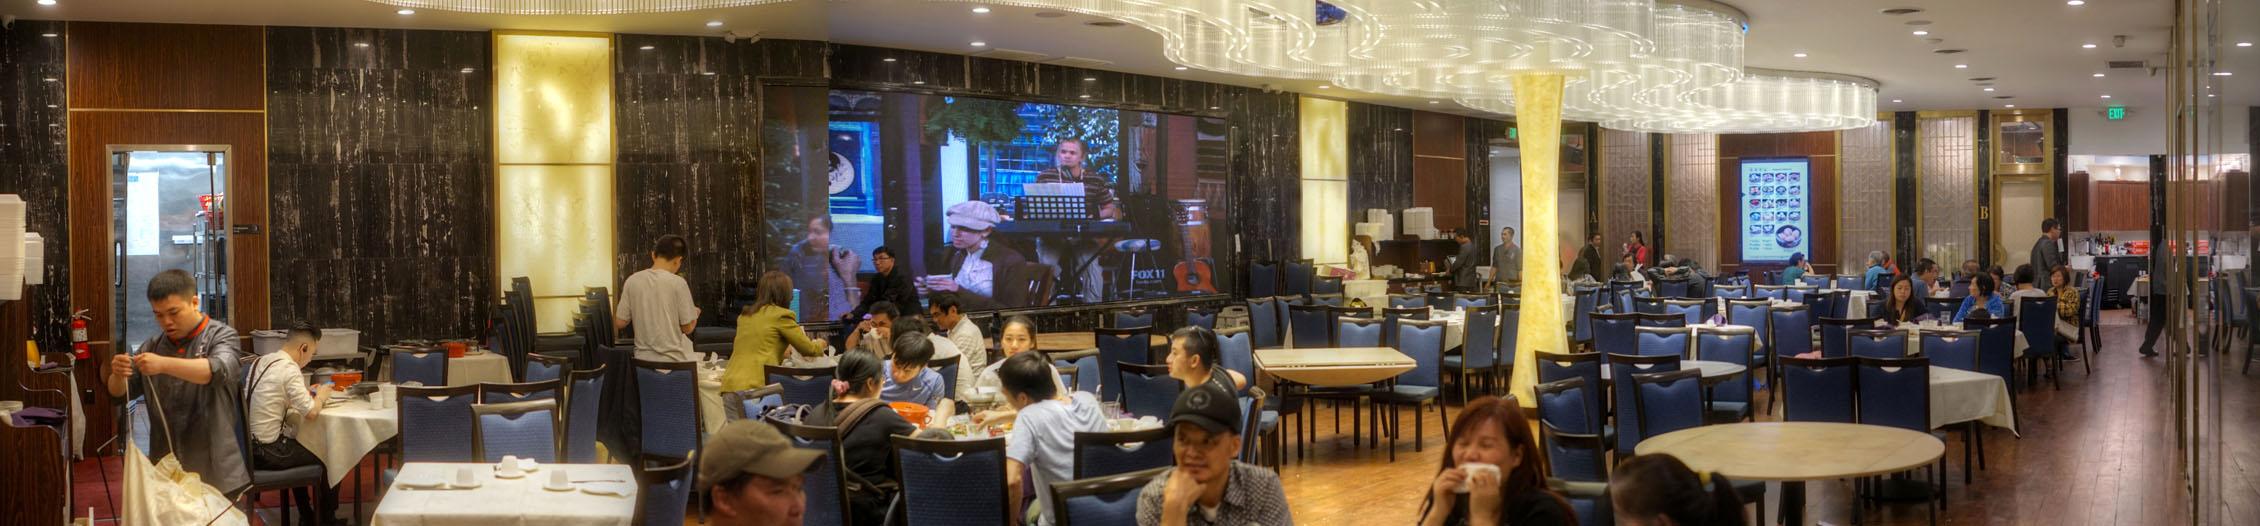 Longo Seafood Interior